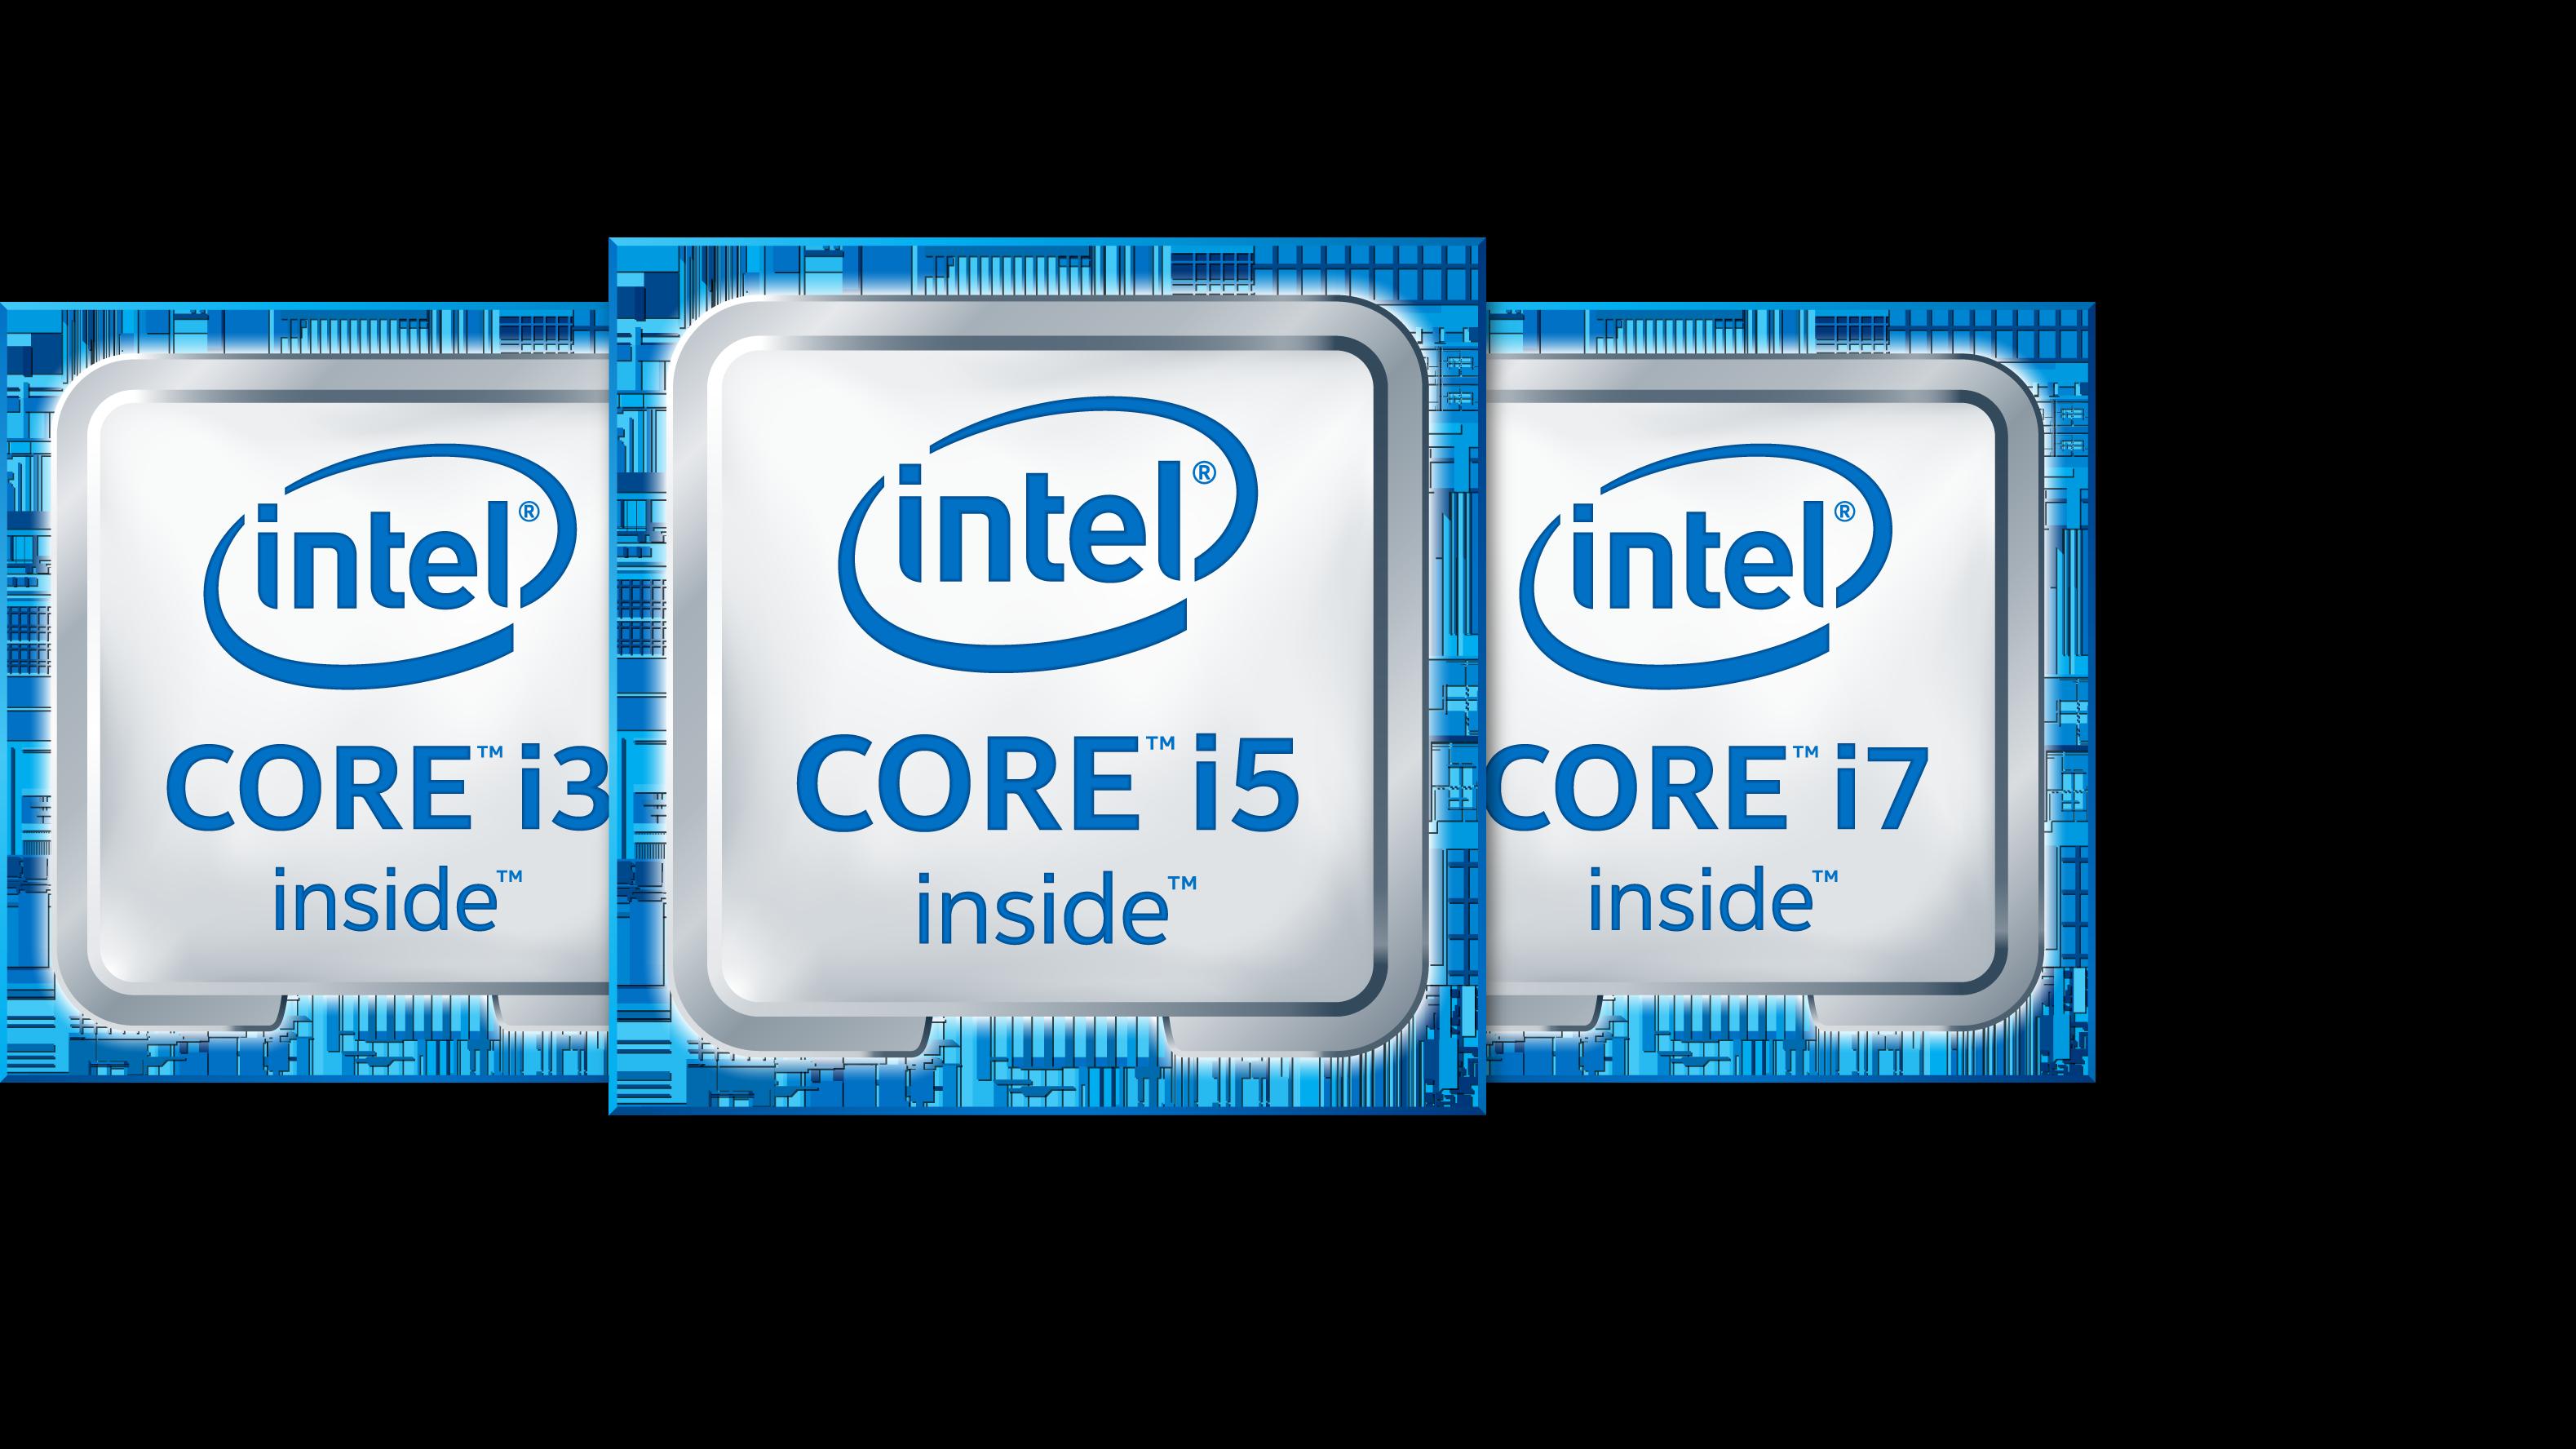 6th Generation Intel® Core™ Processor badge